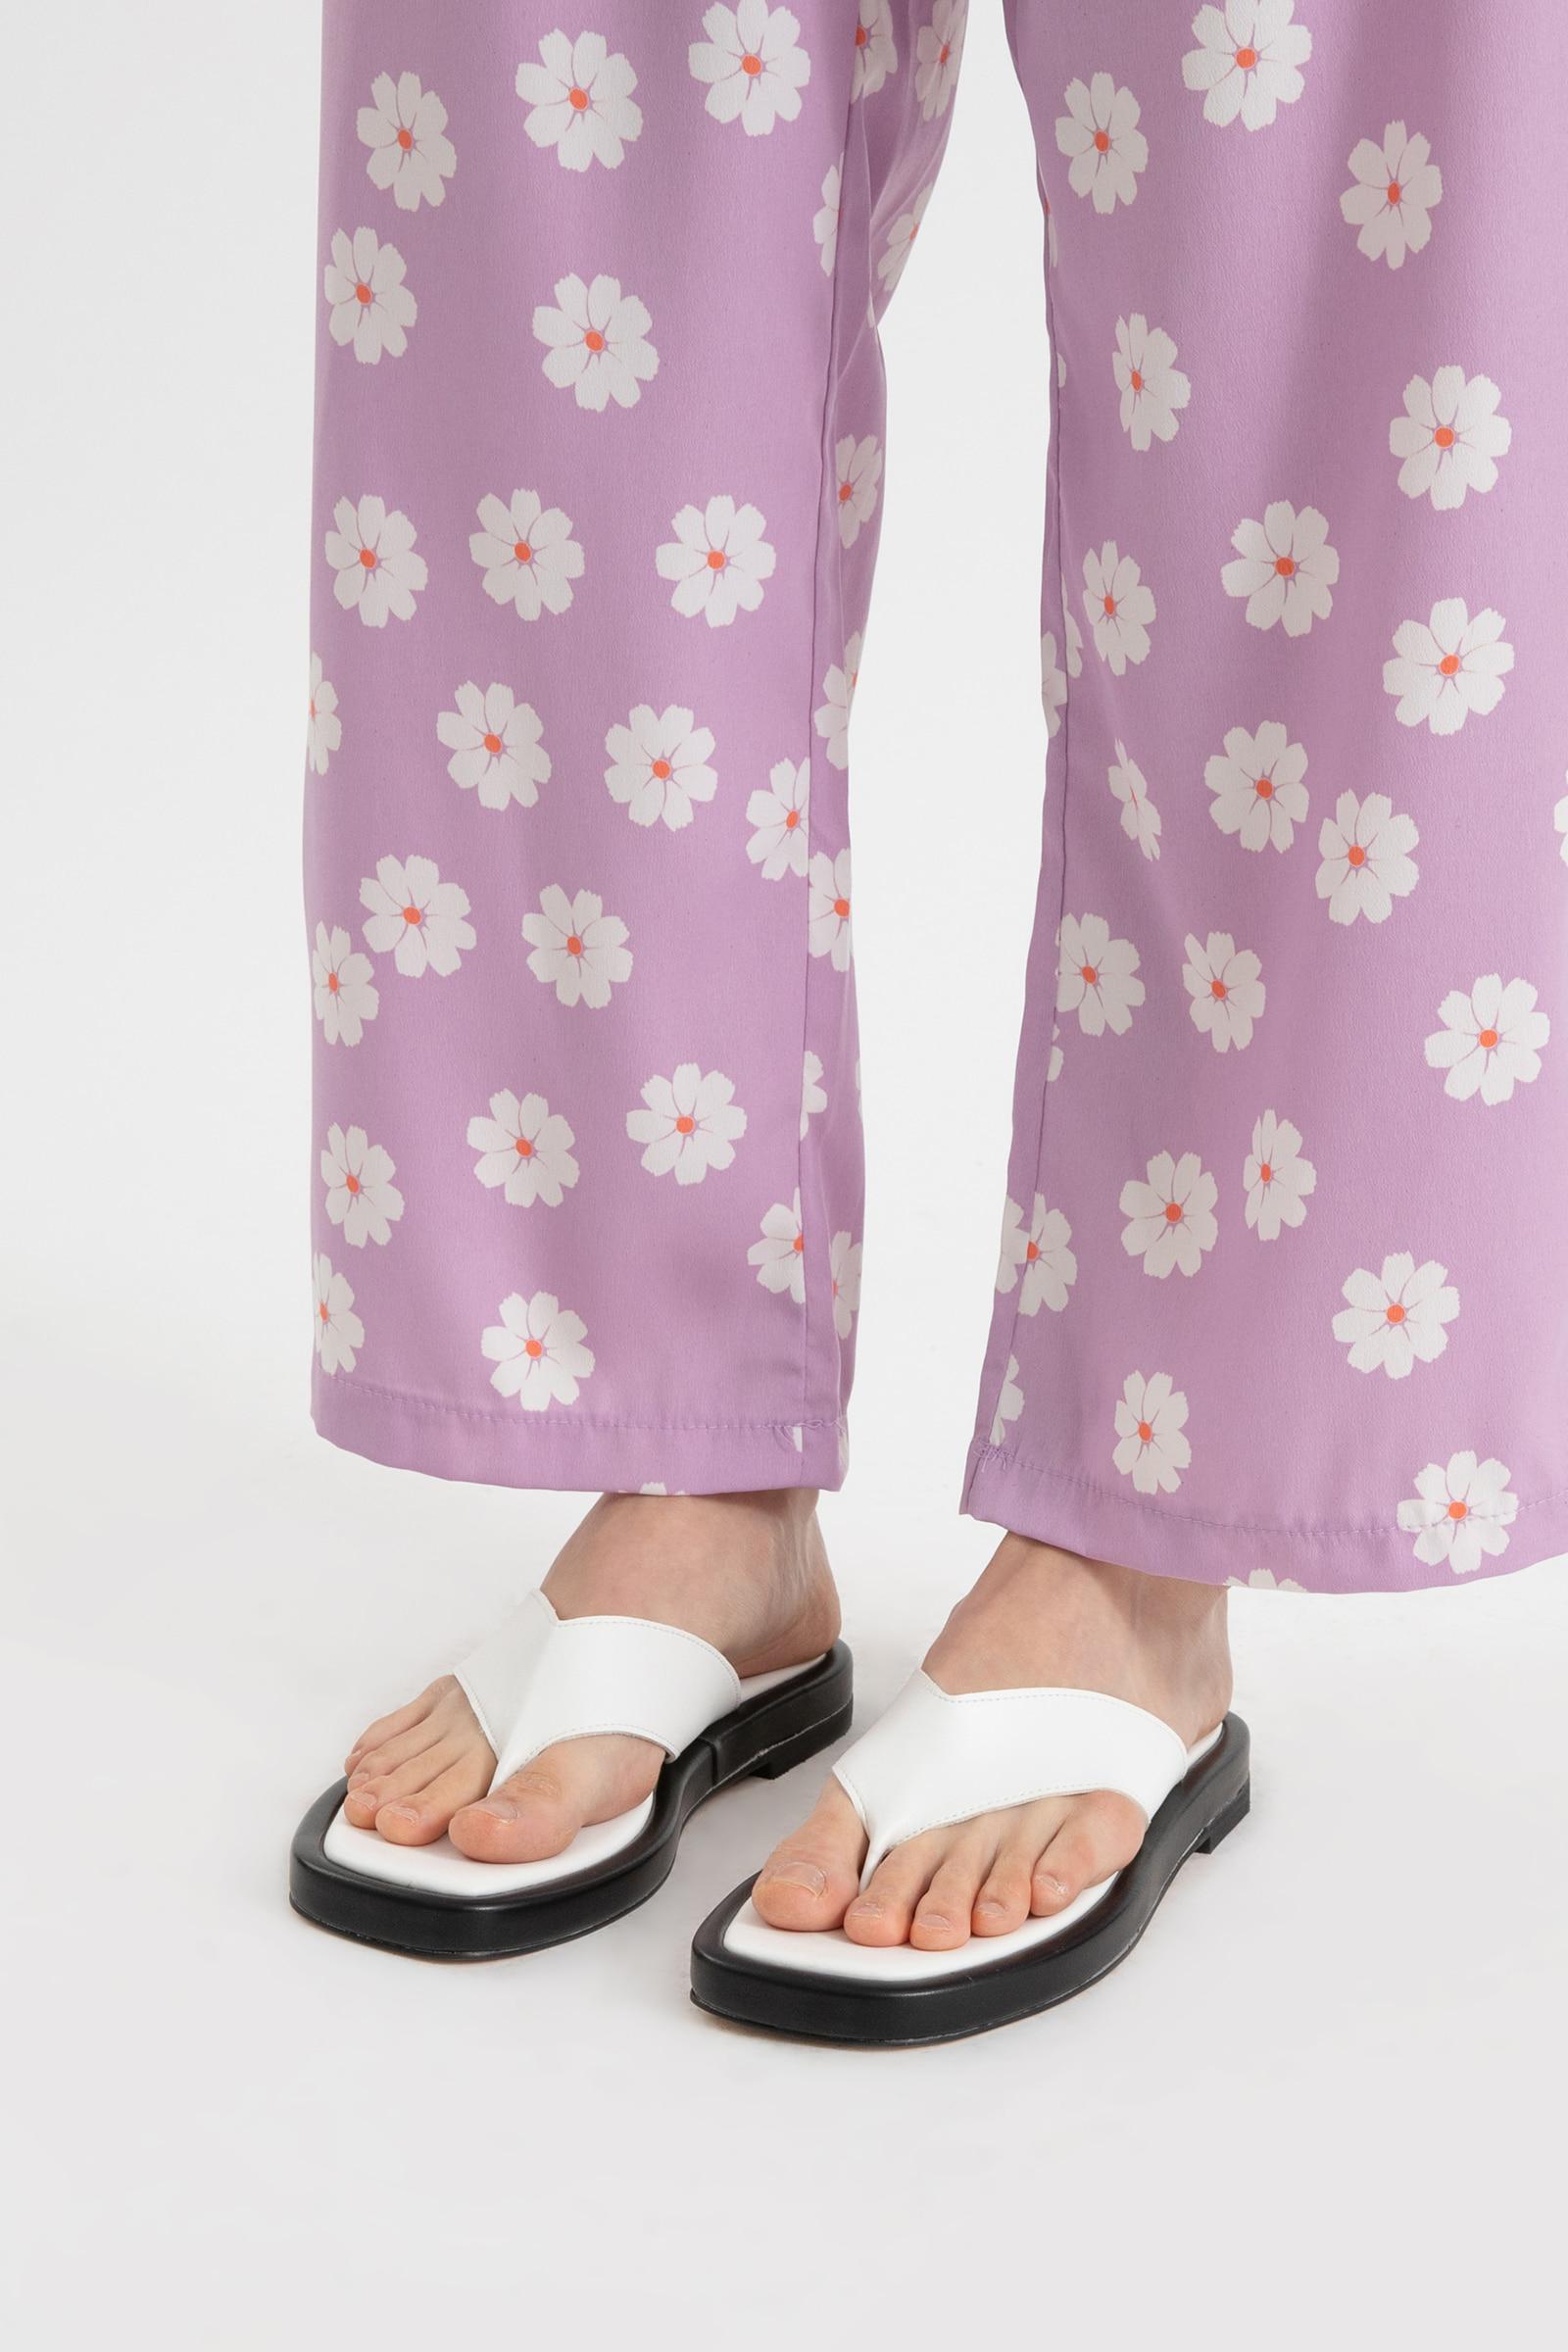 Wearing flip flop sandals